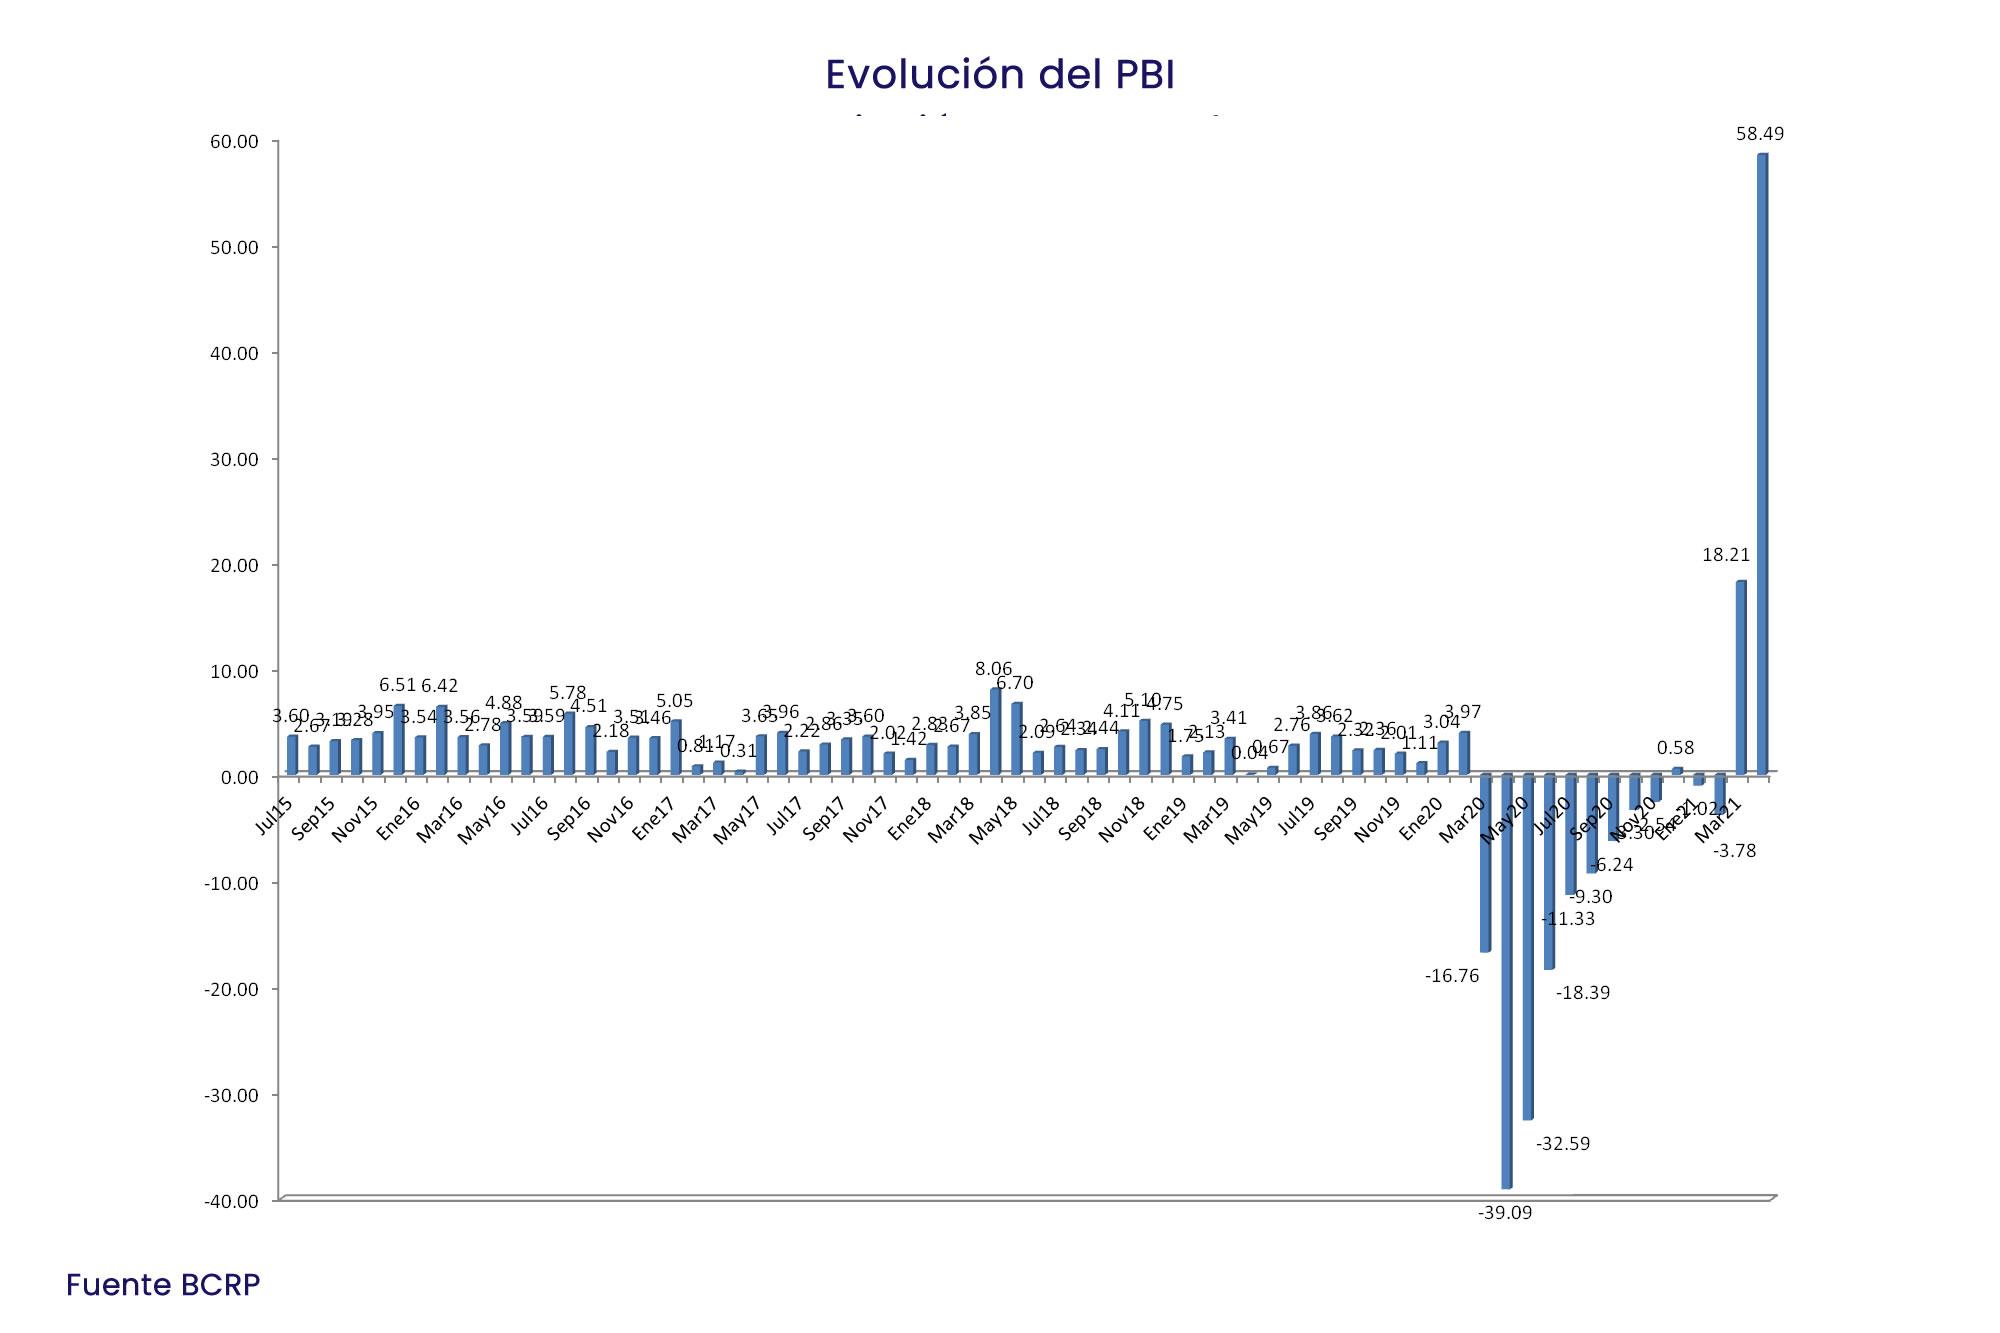 INKARIPERU   EVOLUCION DEL PBI 2015 - 2021